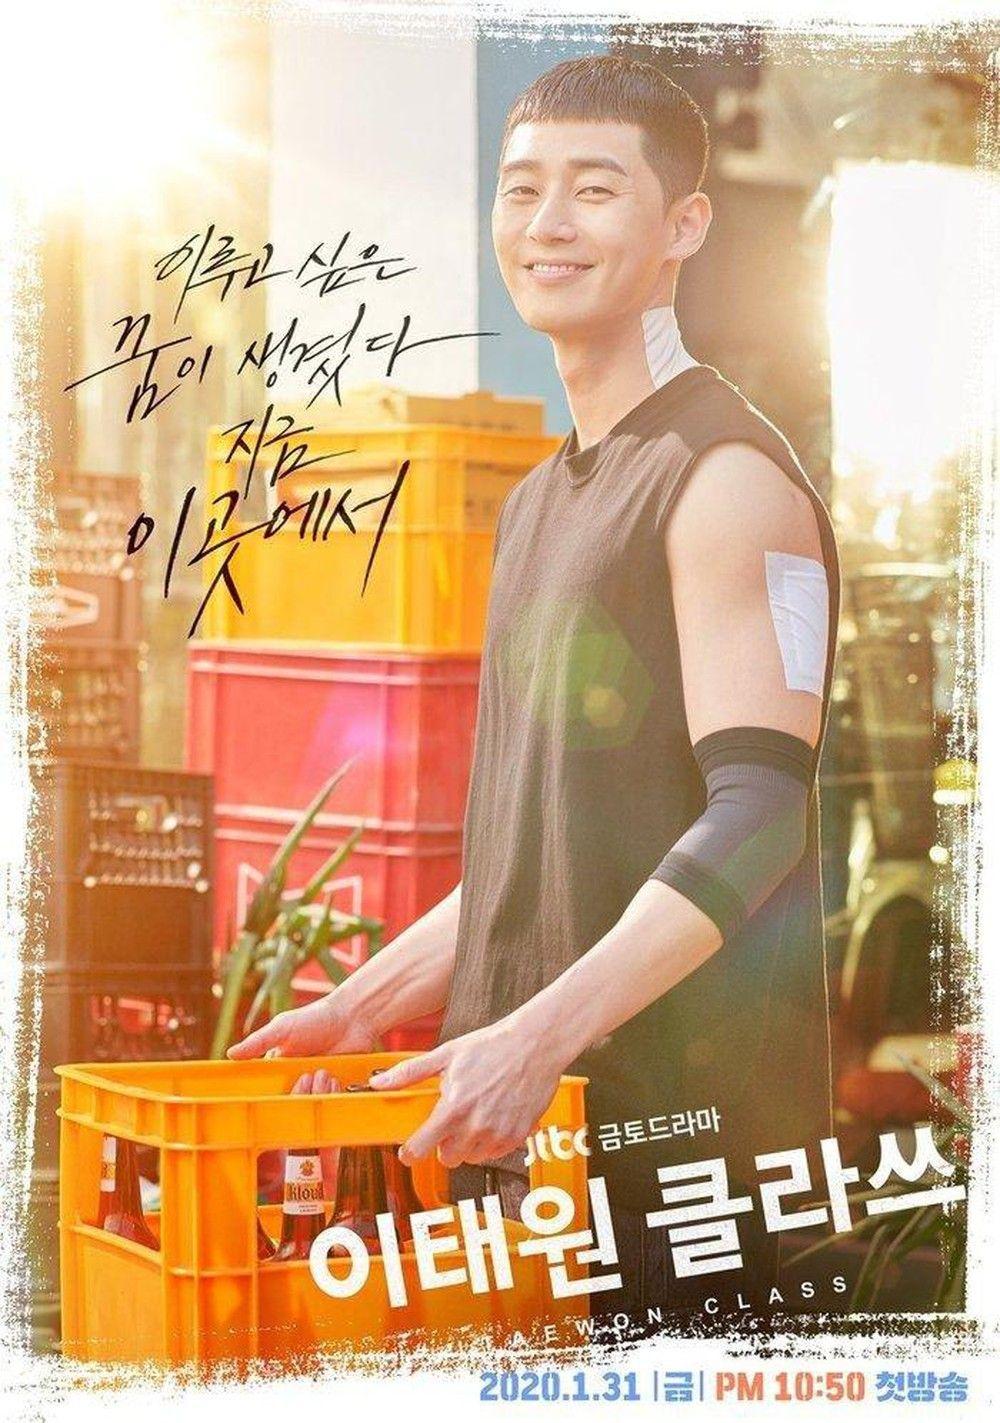 Itaewon Class 이태원 클라쓰 [Jtbc] (2020) 박서준 (박세로이), 권나라